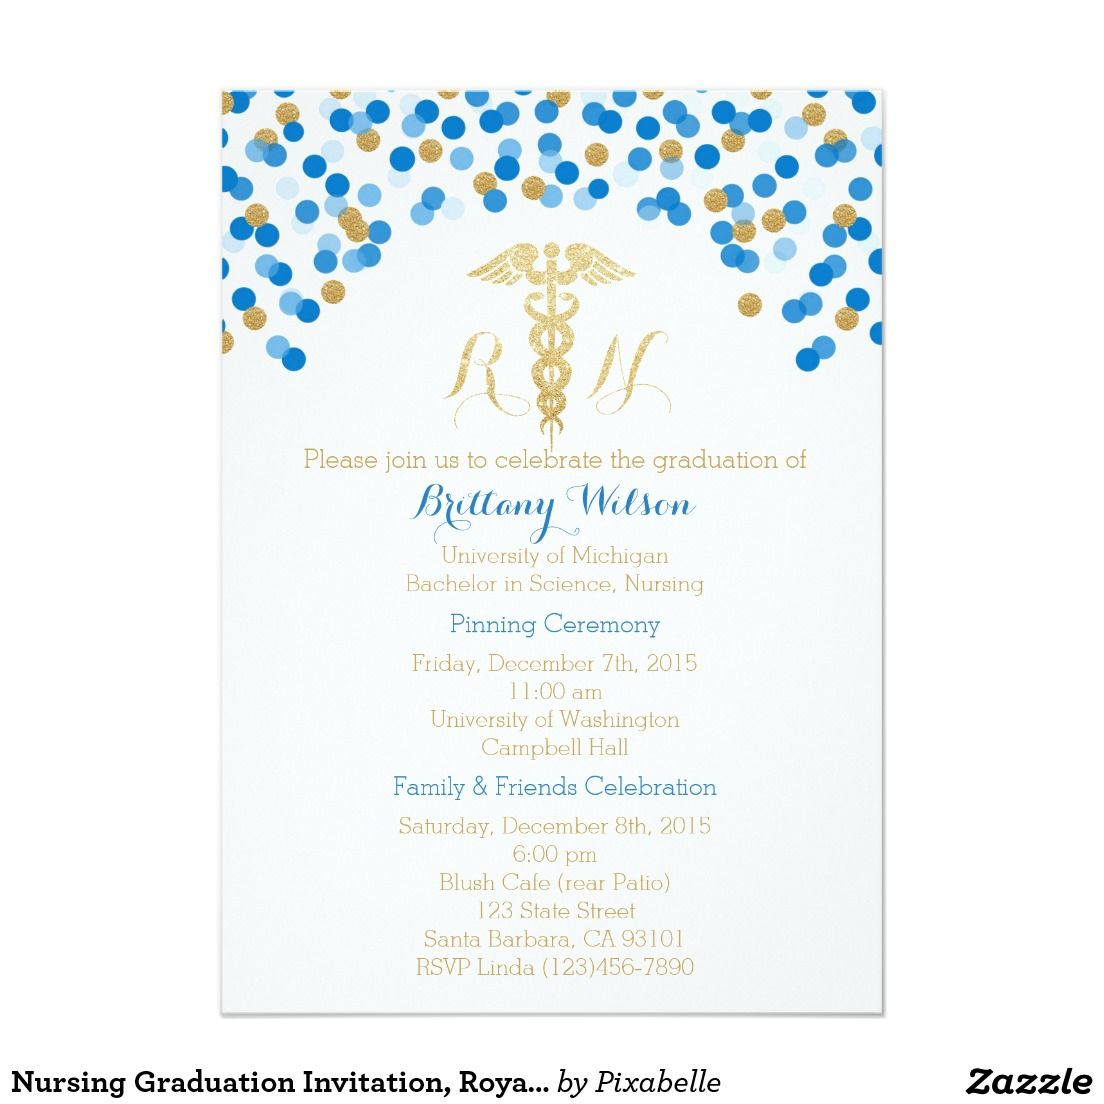 Nursing Graduation Invitation, Royal Blue, Gold 5x7 Paper ...